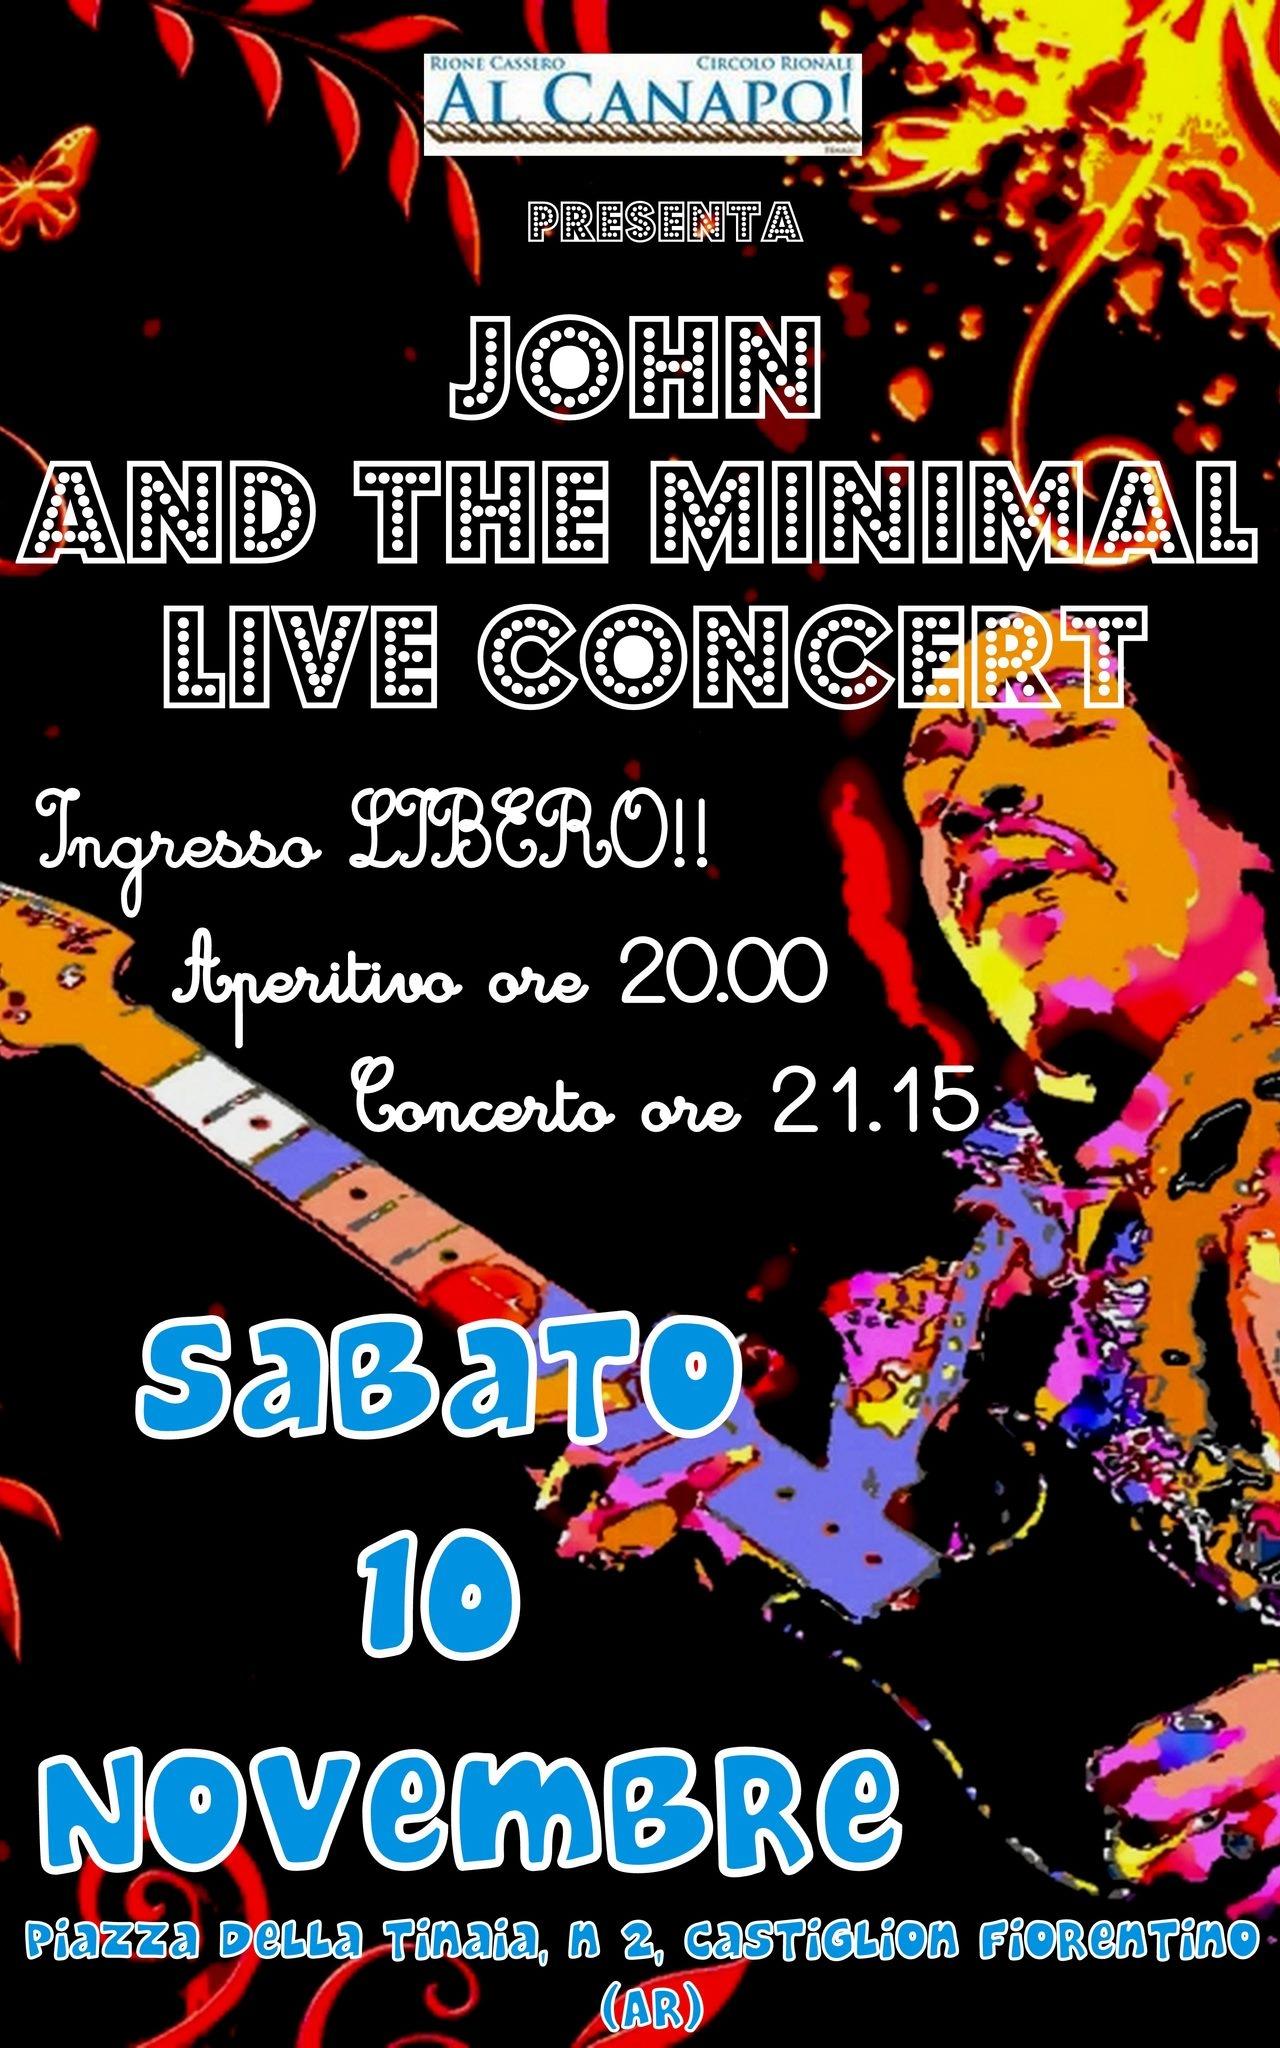 John and the mininal live al